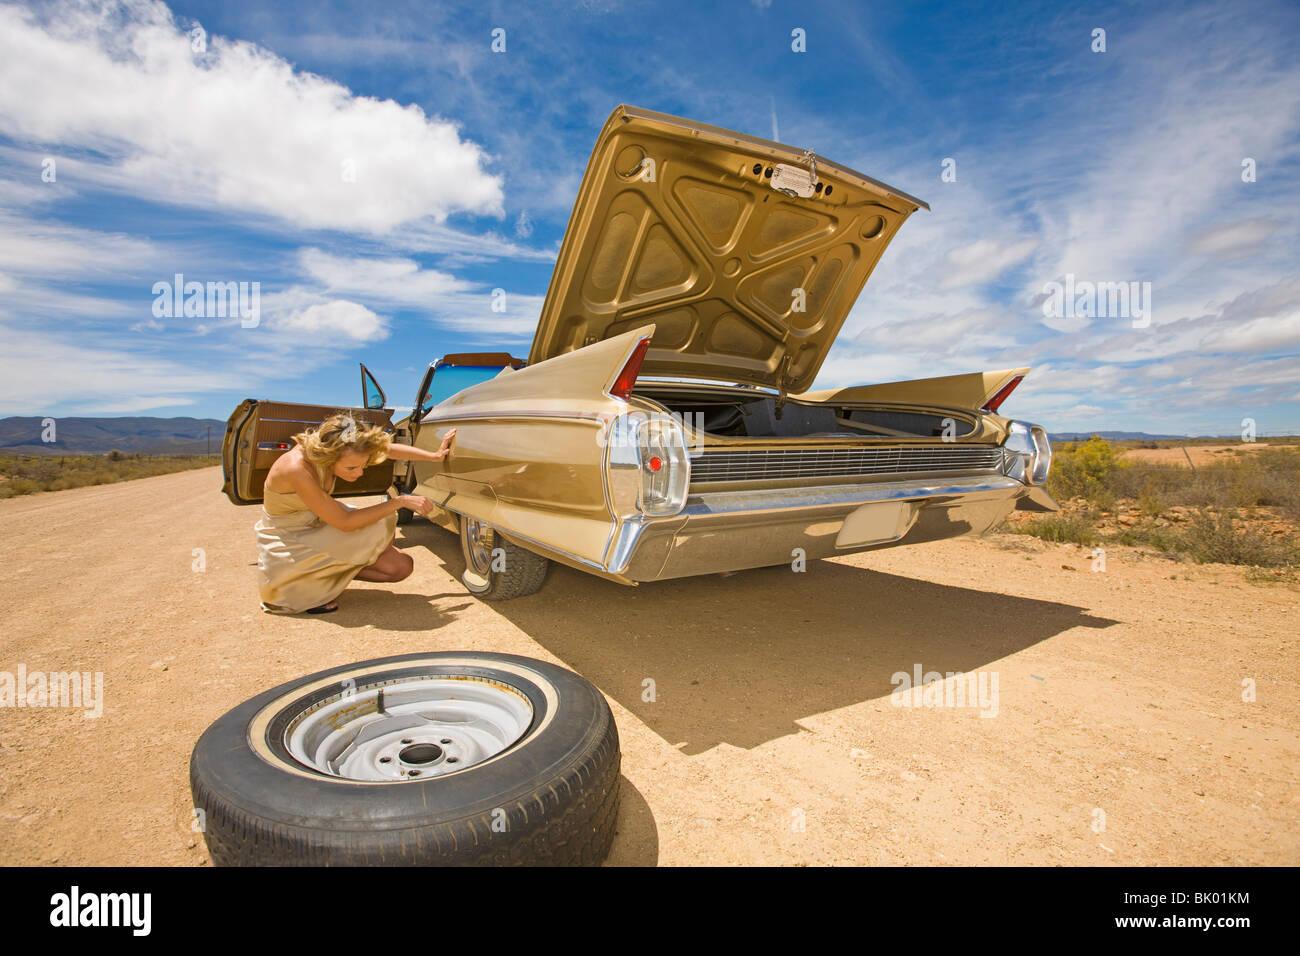 Break down in the desert - Stock Image